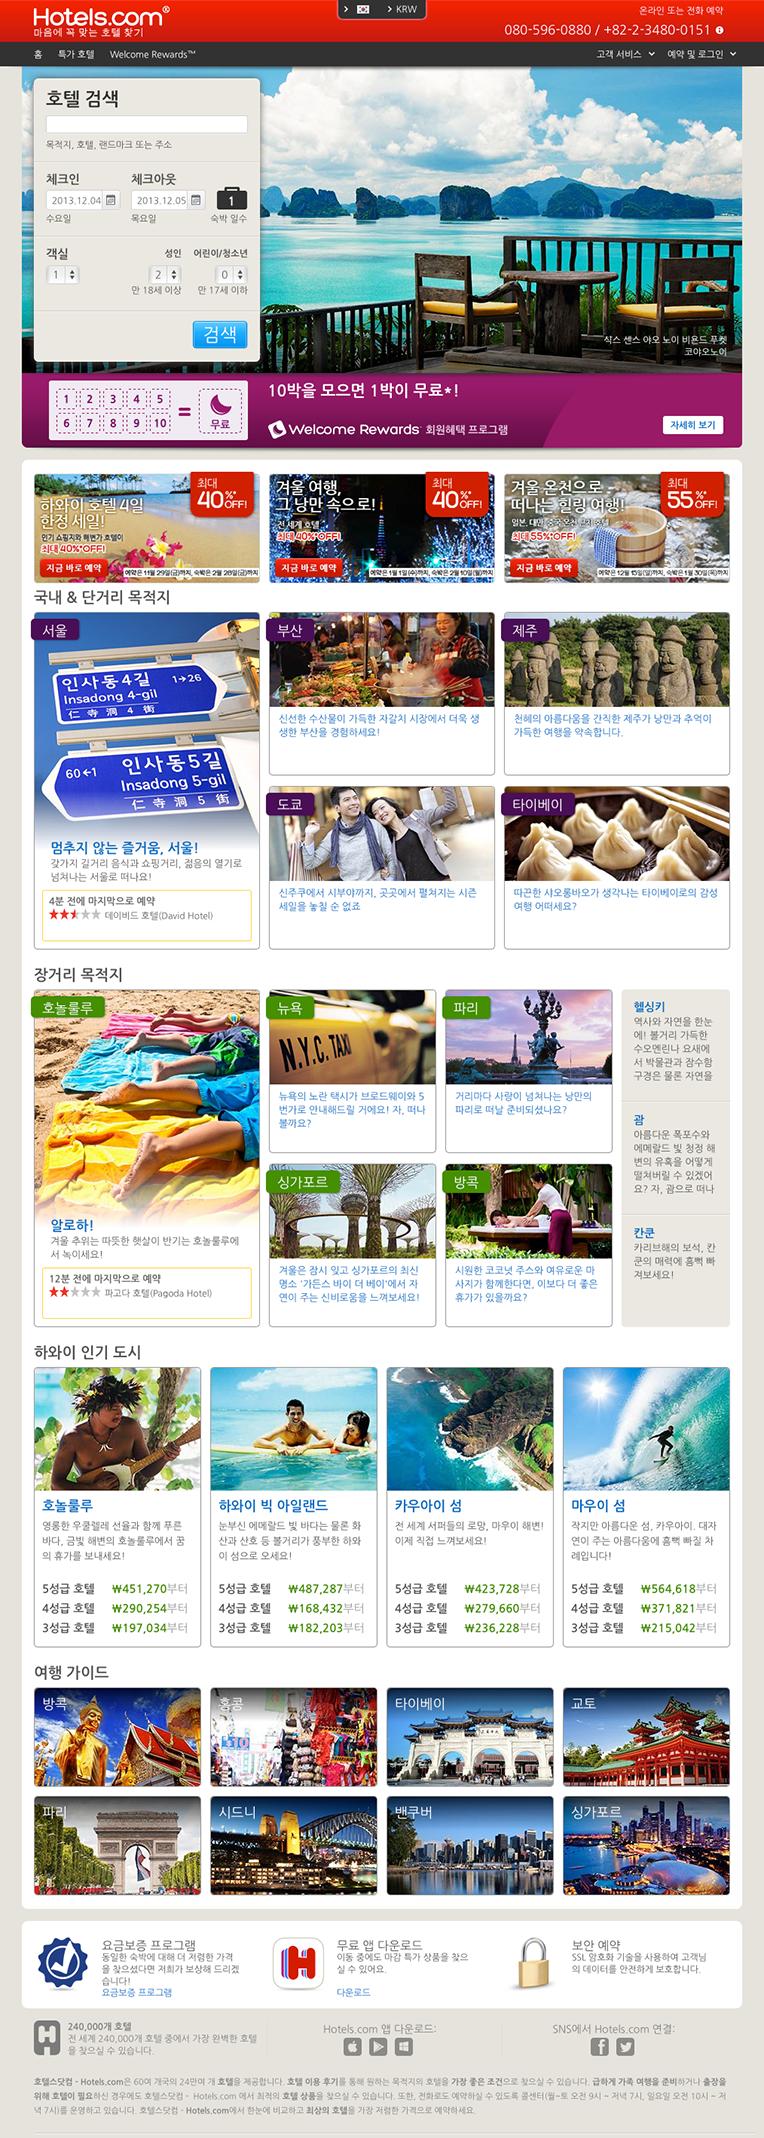 Hotels.com KR